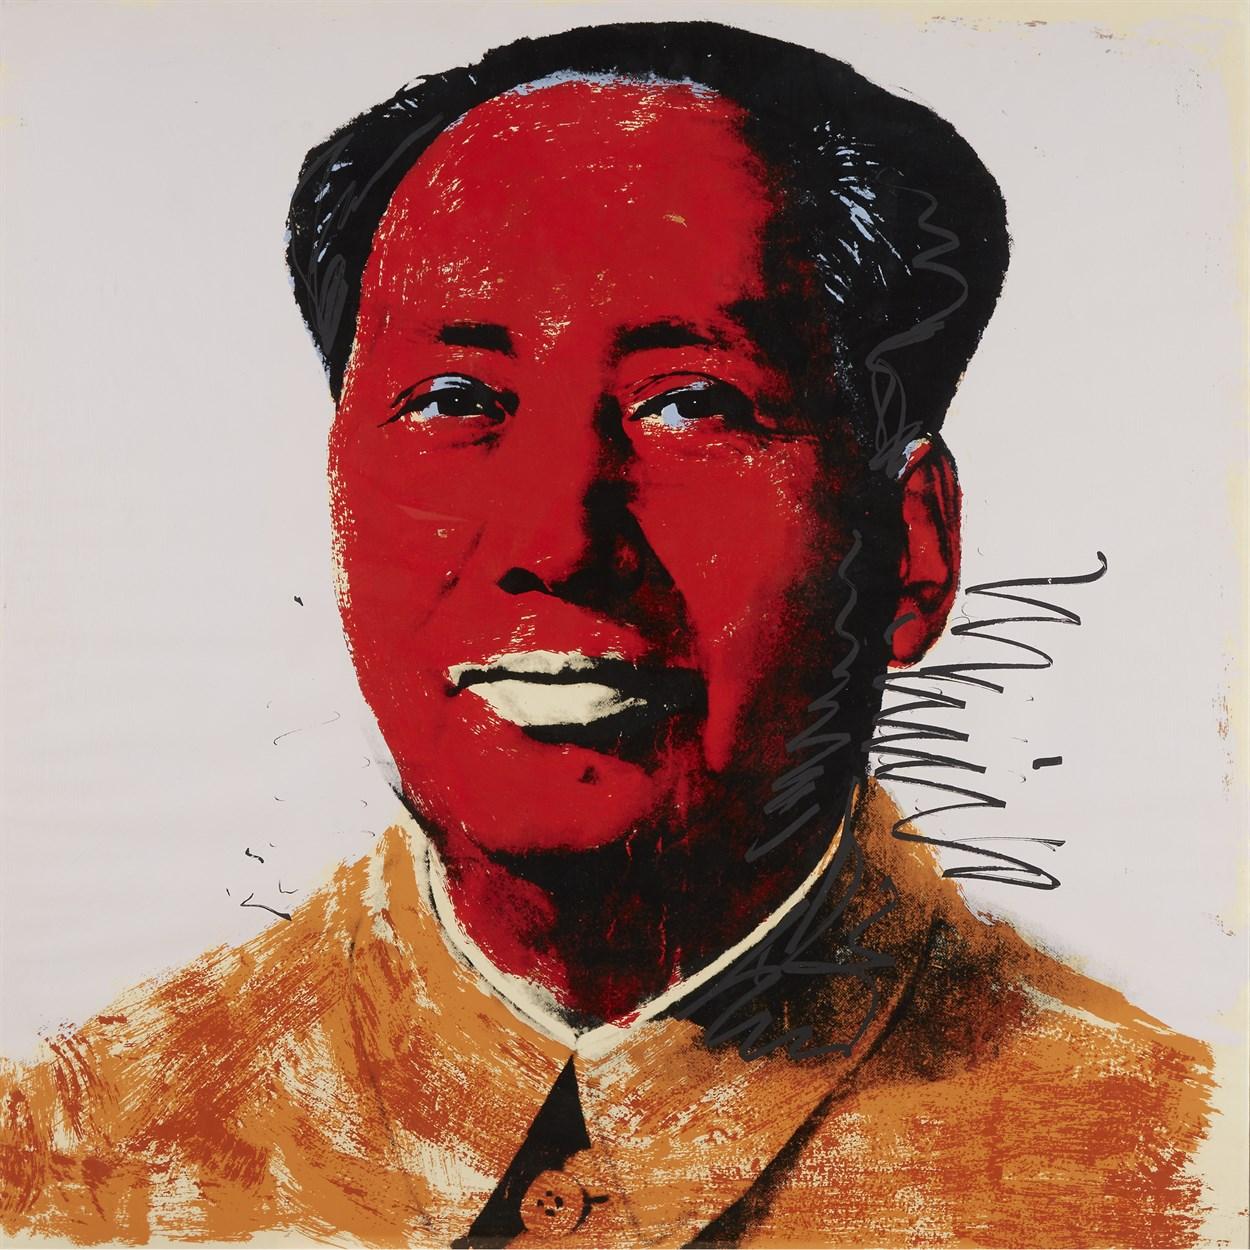 Lot 53 - Andy Warhol (American, 1928-1987)